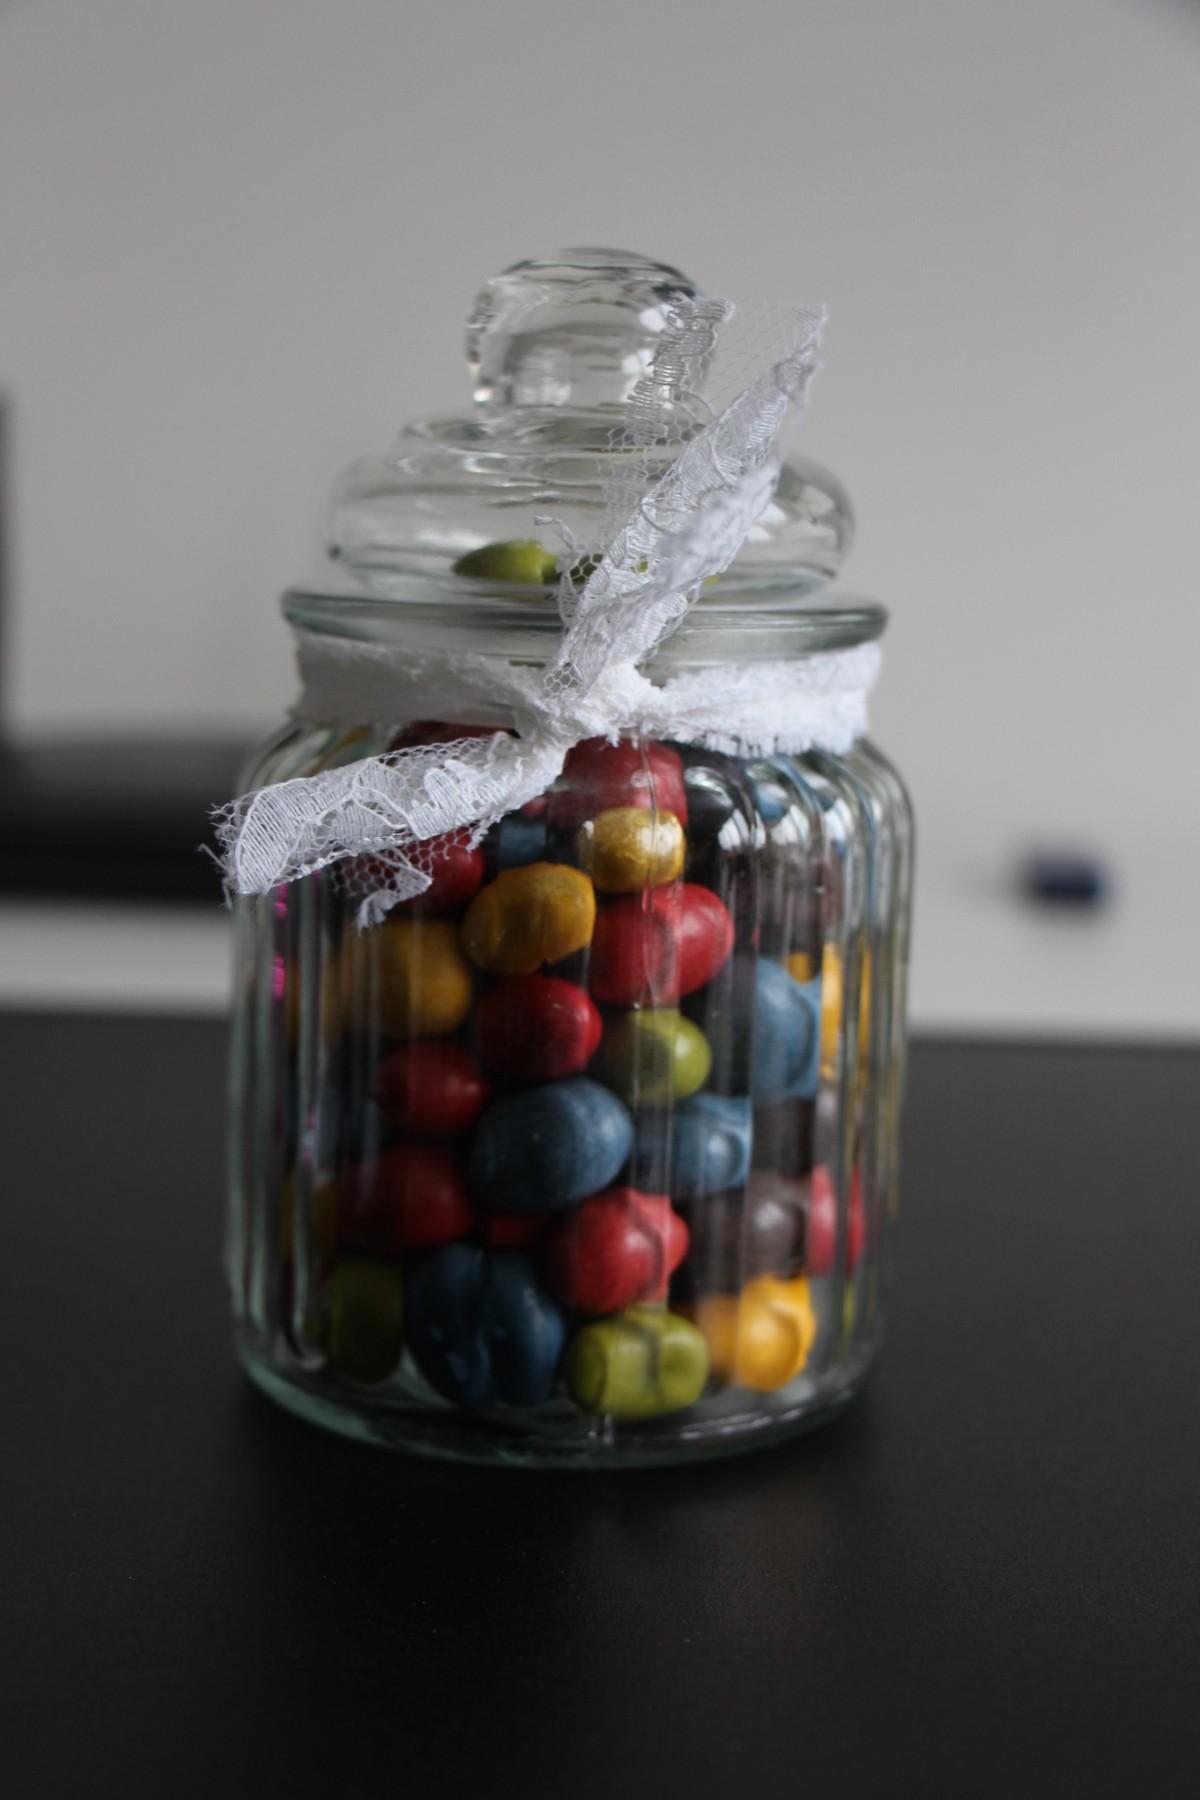 Kostenlose foto s glas mahlzeit lebensmittel produzieren farbe flasche bunt - Kuchendeko foto ...